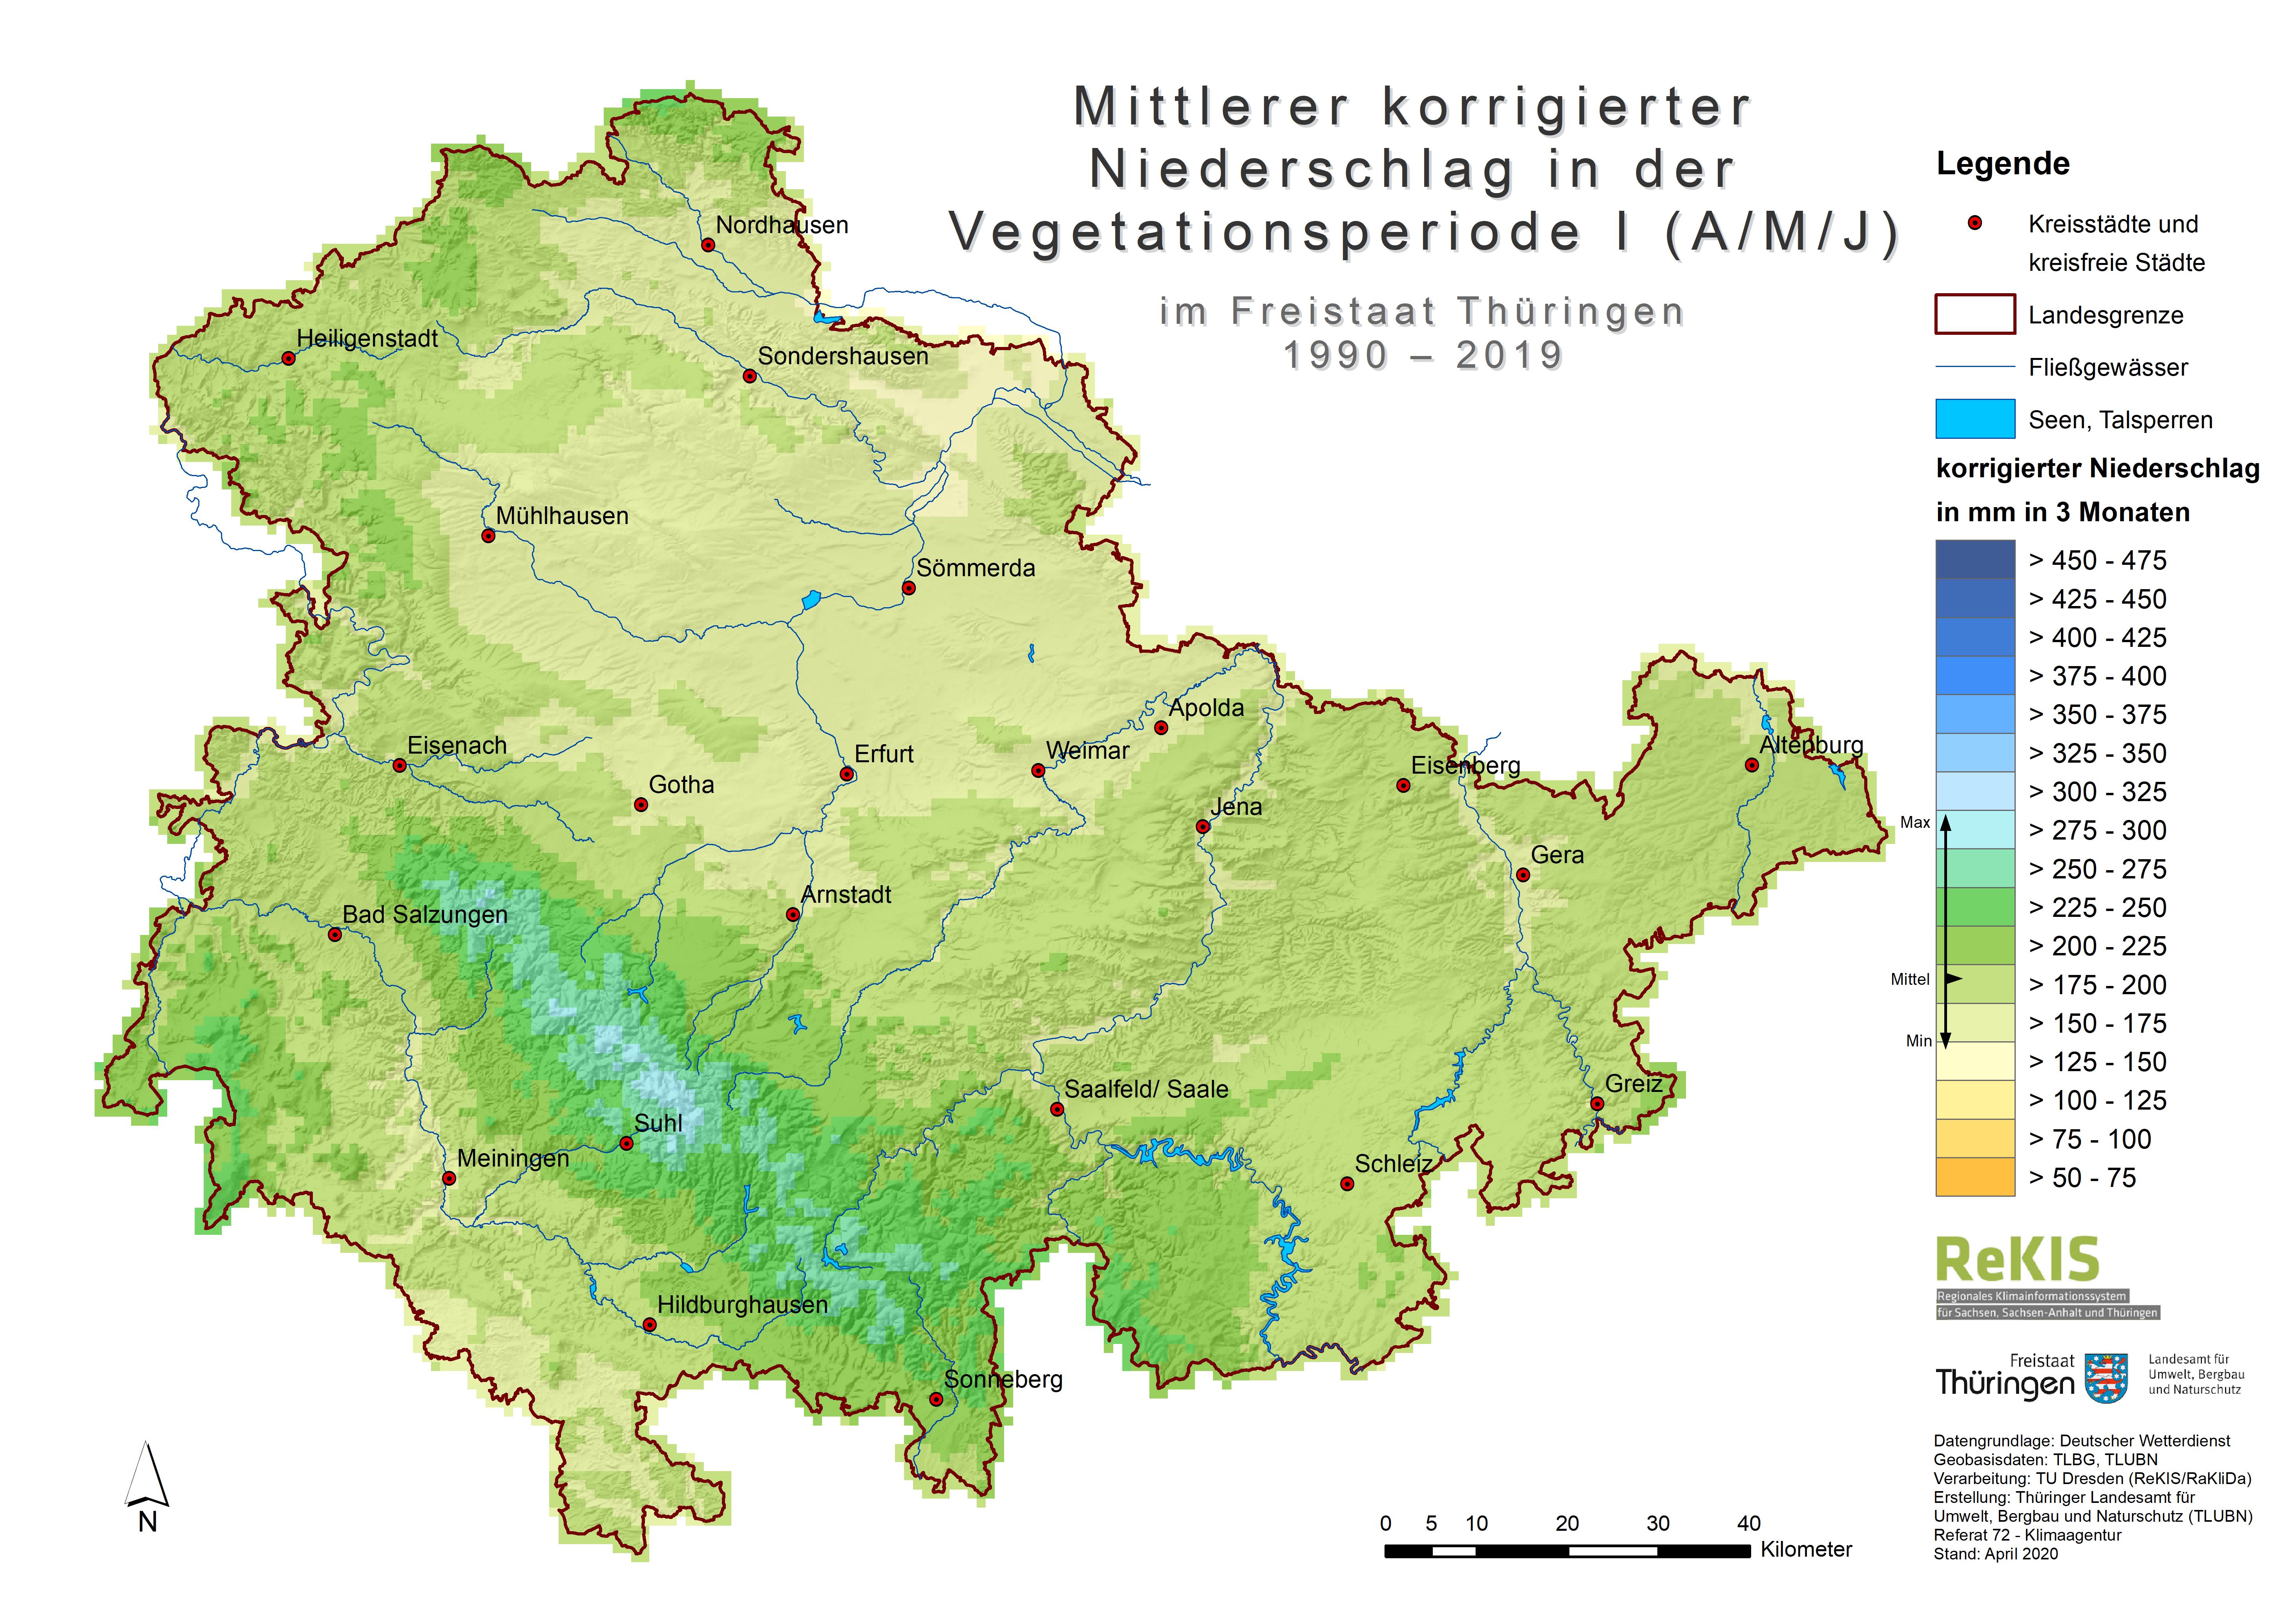 Thüringen-Karte des mittleren korrigierten Niederschlag in der Vegetationsperiode 1 (April, Mai, Juni) 1990-2019 in Thüringen